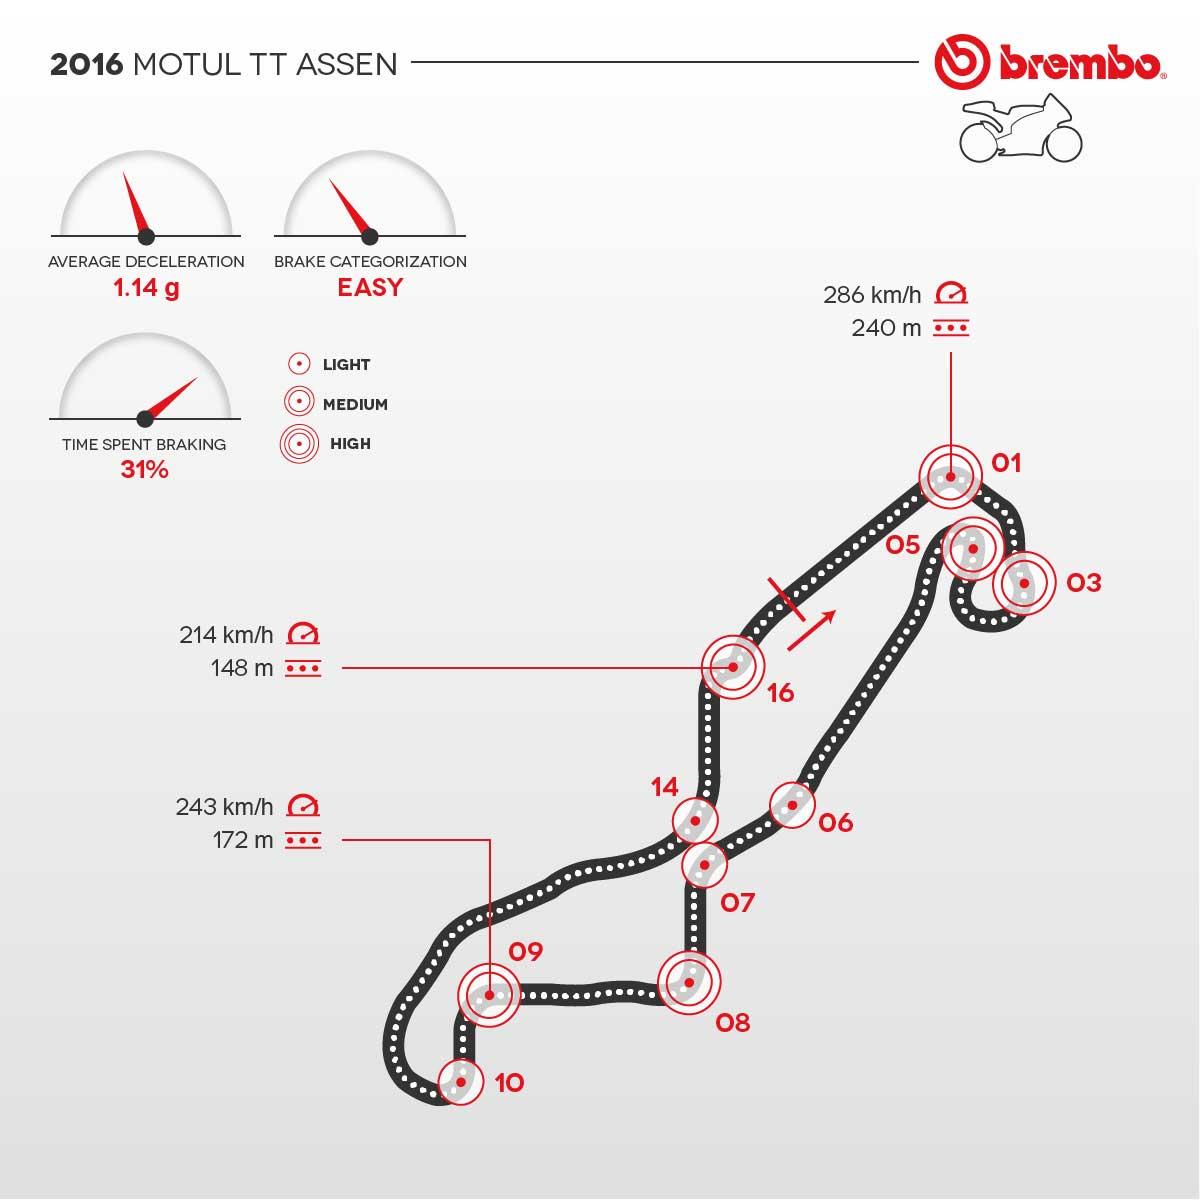 Formula 1 2016: the Dutch MotoGP according to Brembo ...